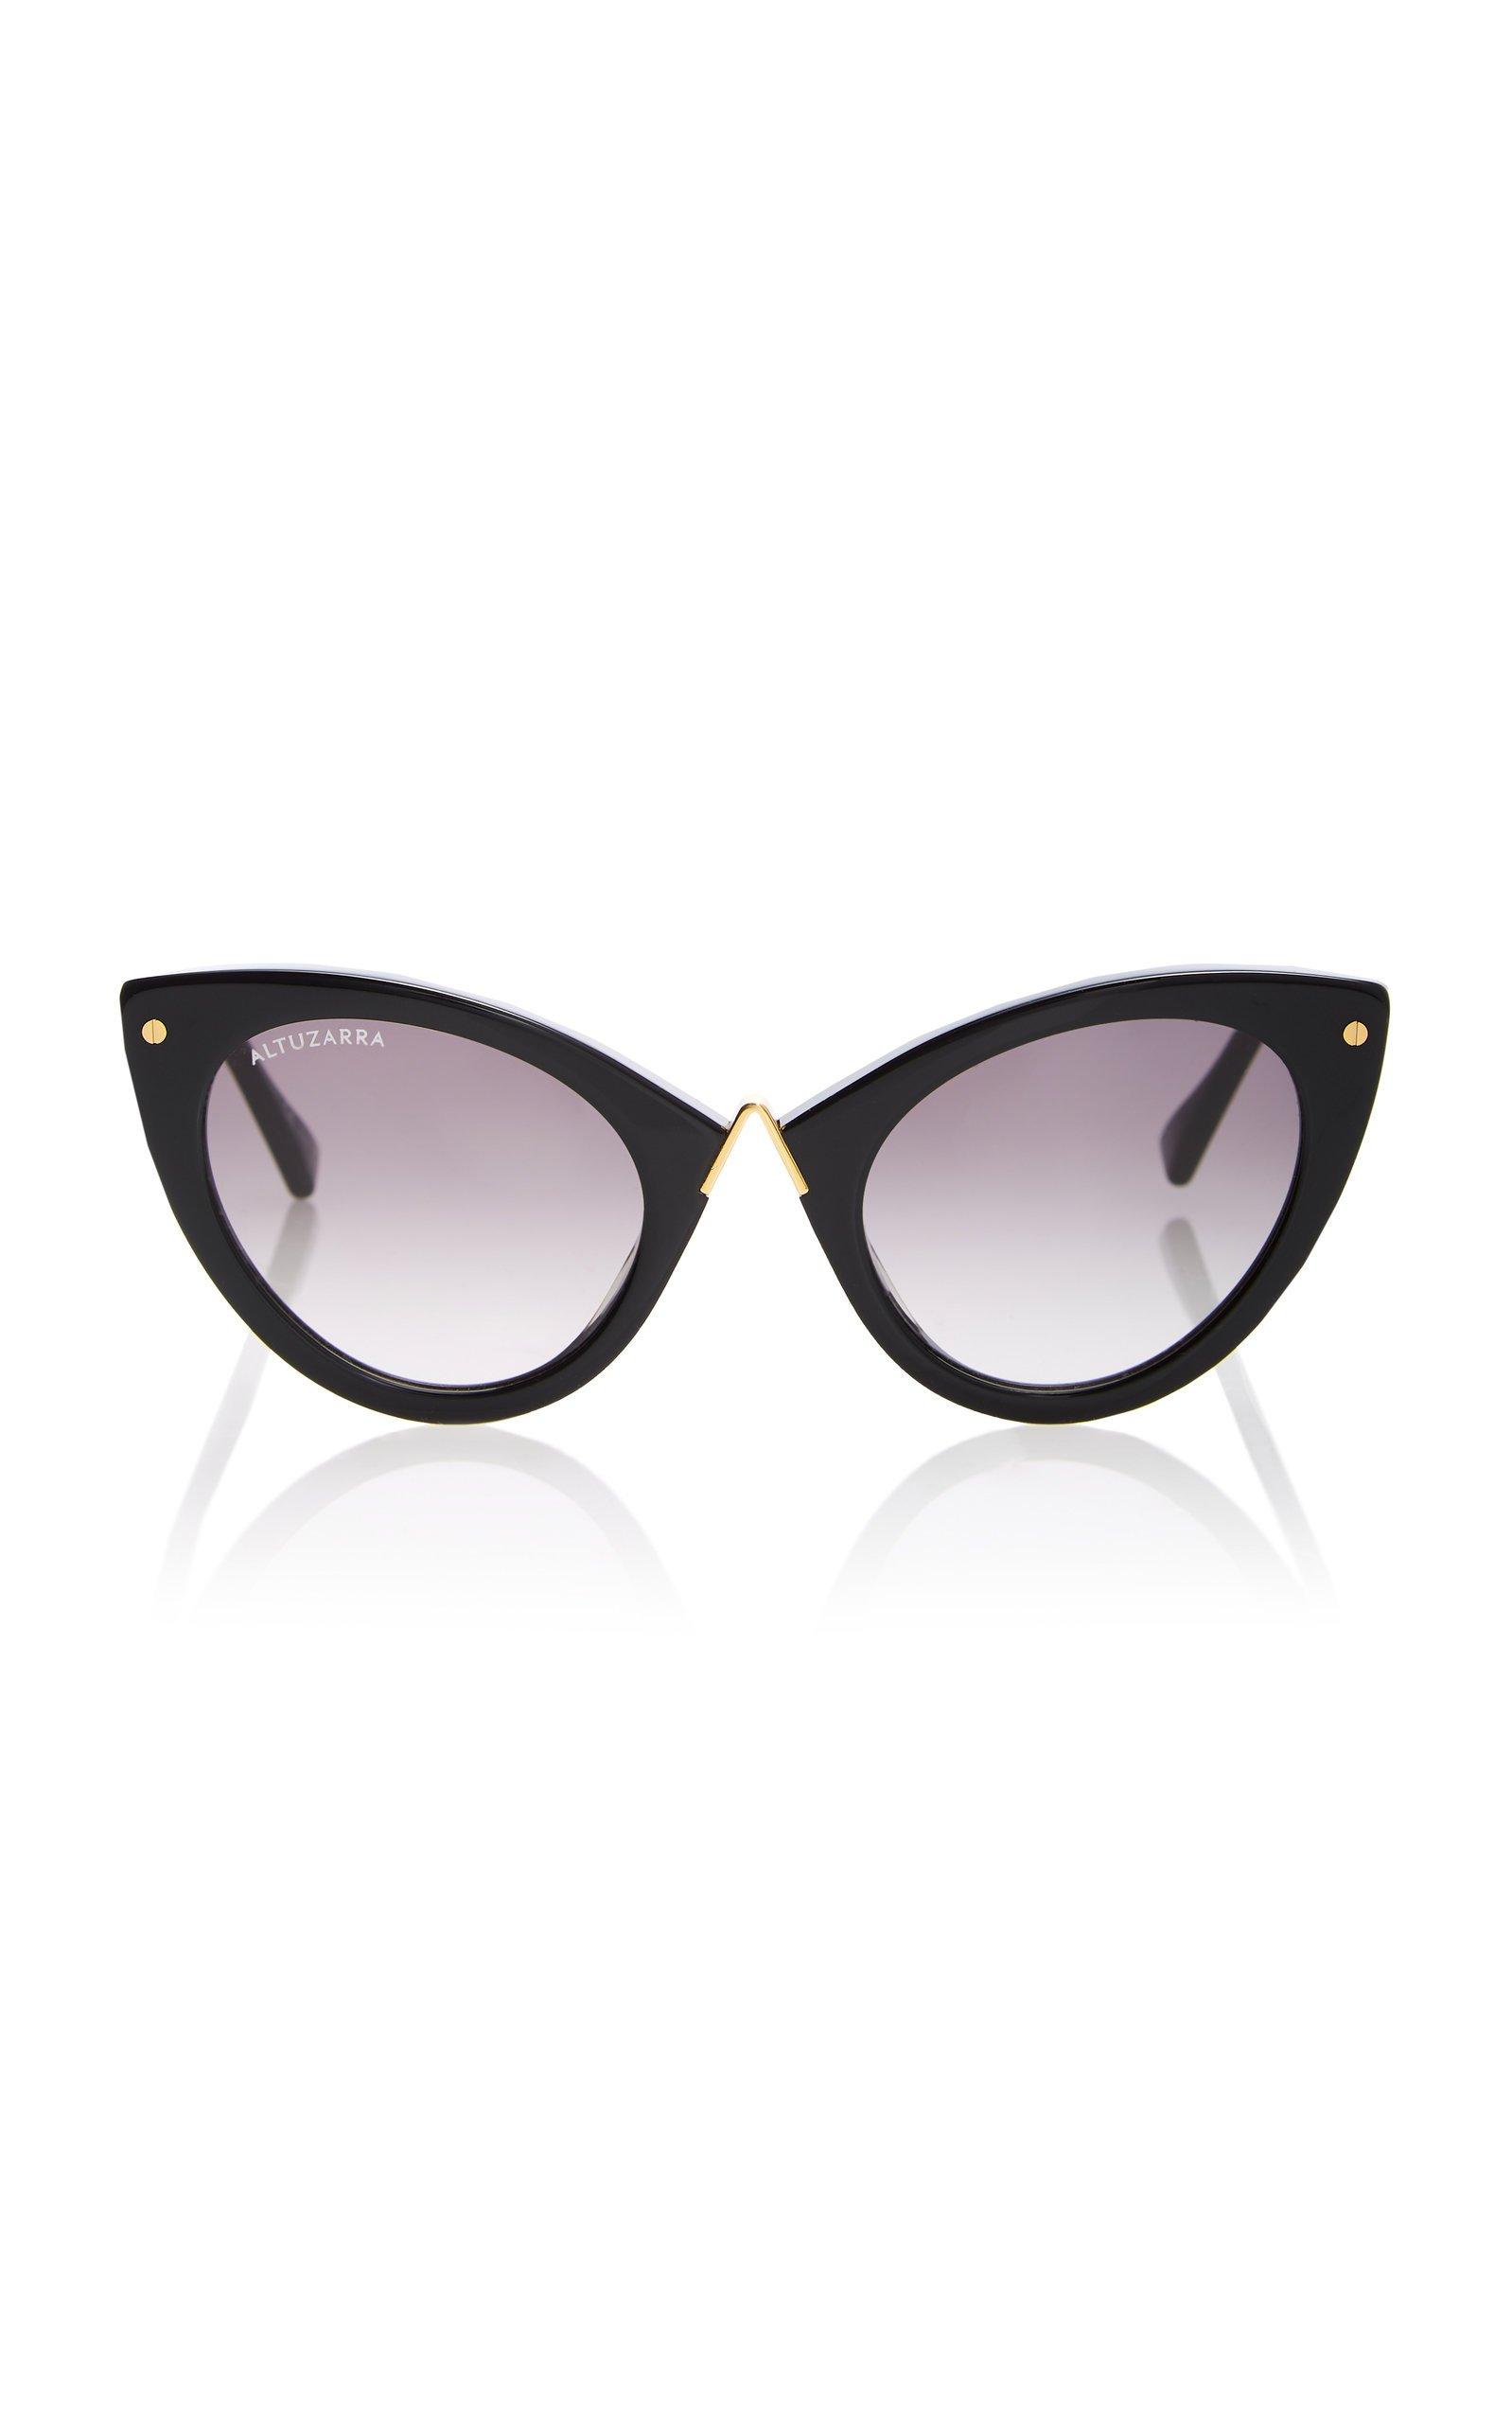 Altuzarra sunglasses Acetate Cat-Eye Sunglasses